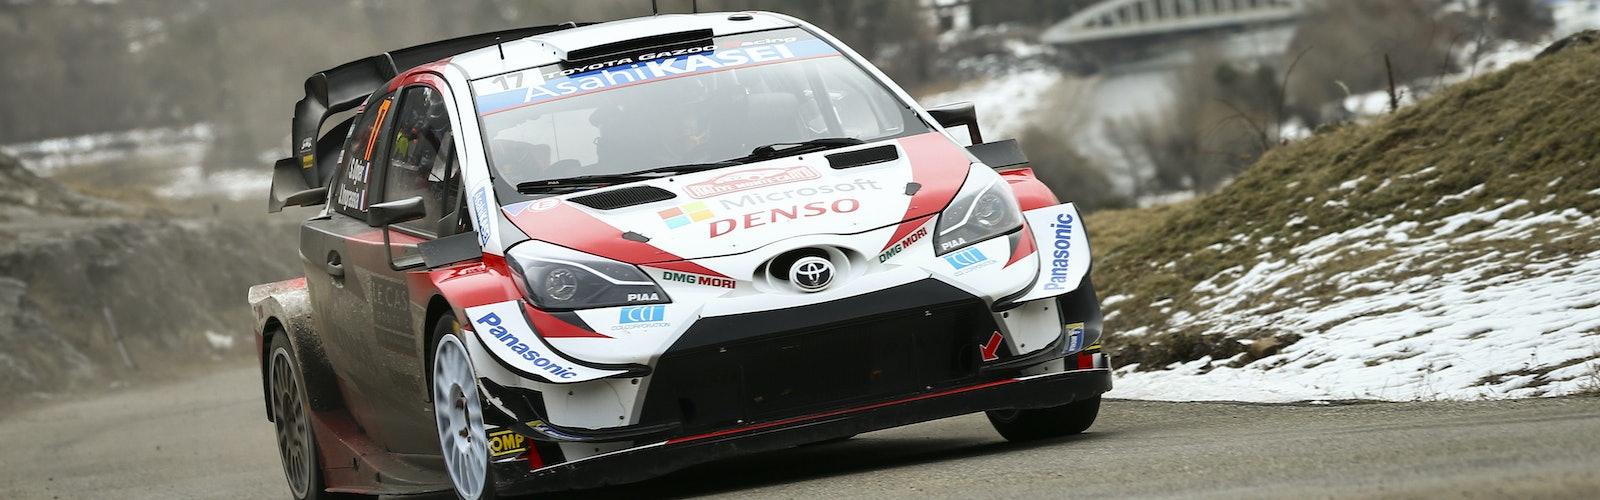 WRC_2020_Rd.1_211